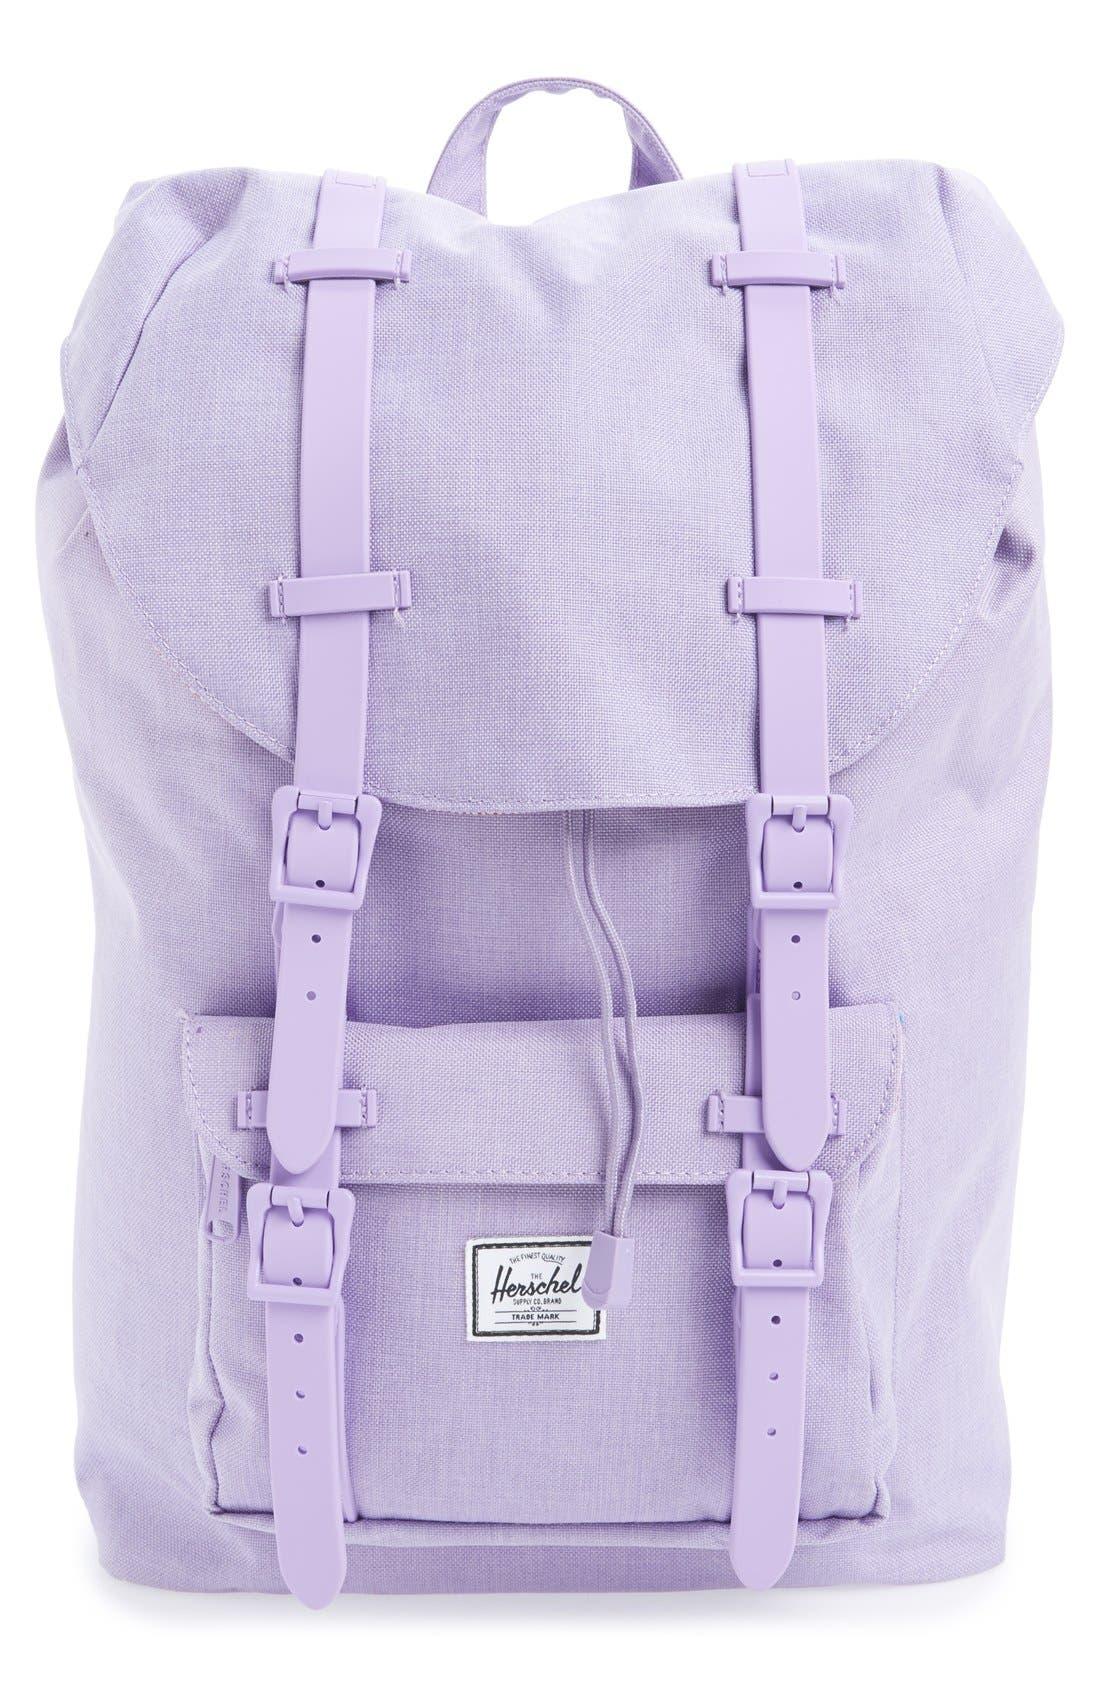 Alternate Image 1 Selected - Herschel Supply Co. 'Little America- Mid Volume' Backpack